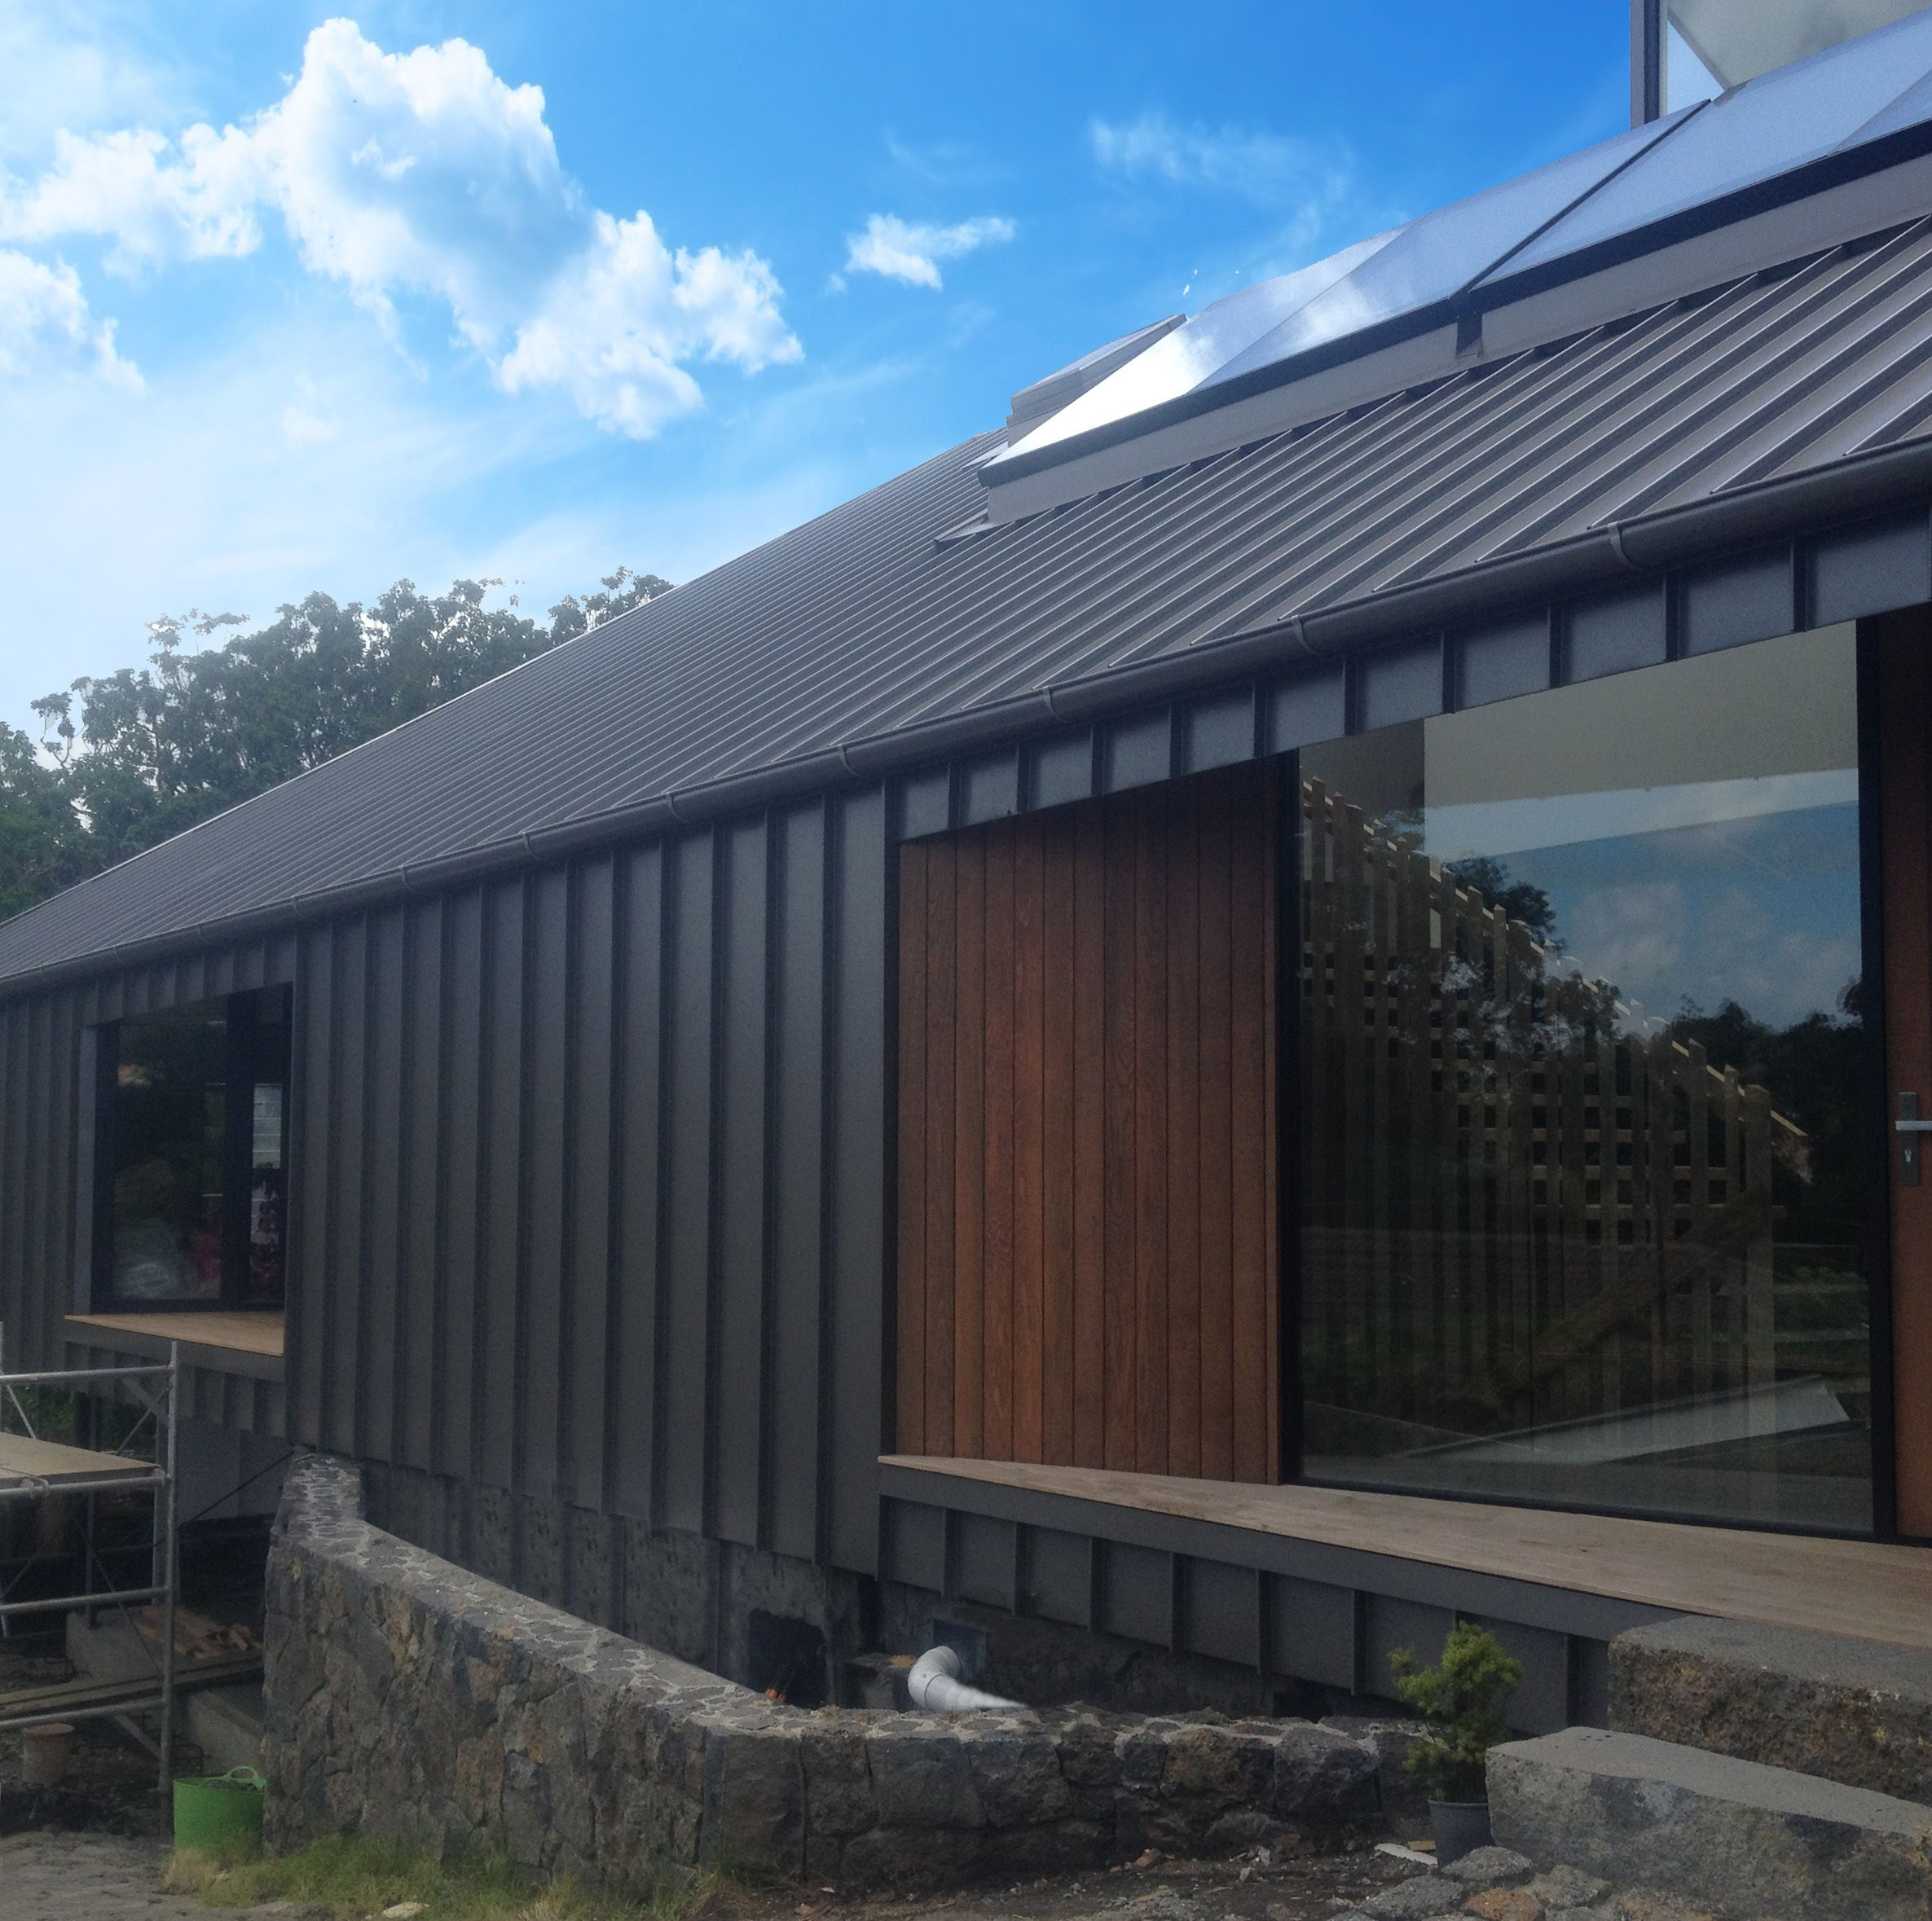 Espan Riteline Roofing roofline Pinterest Steel cladding